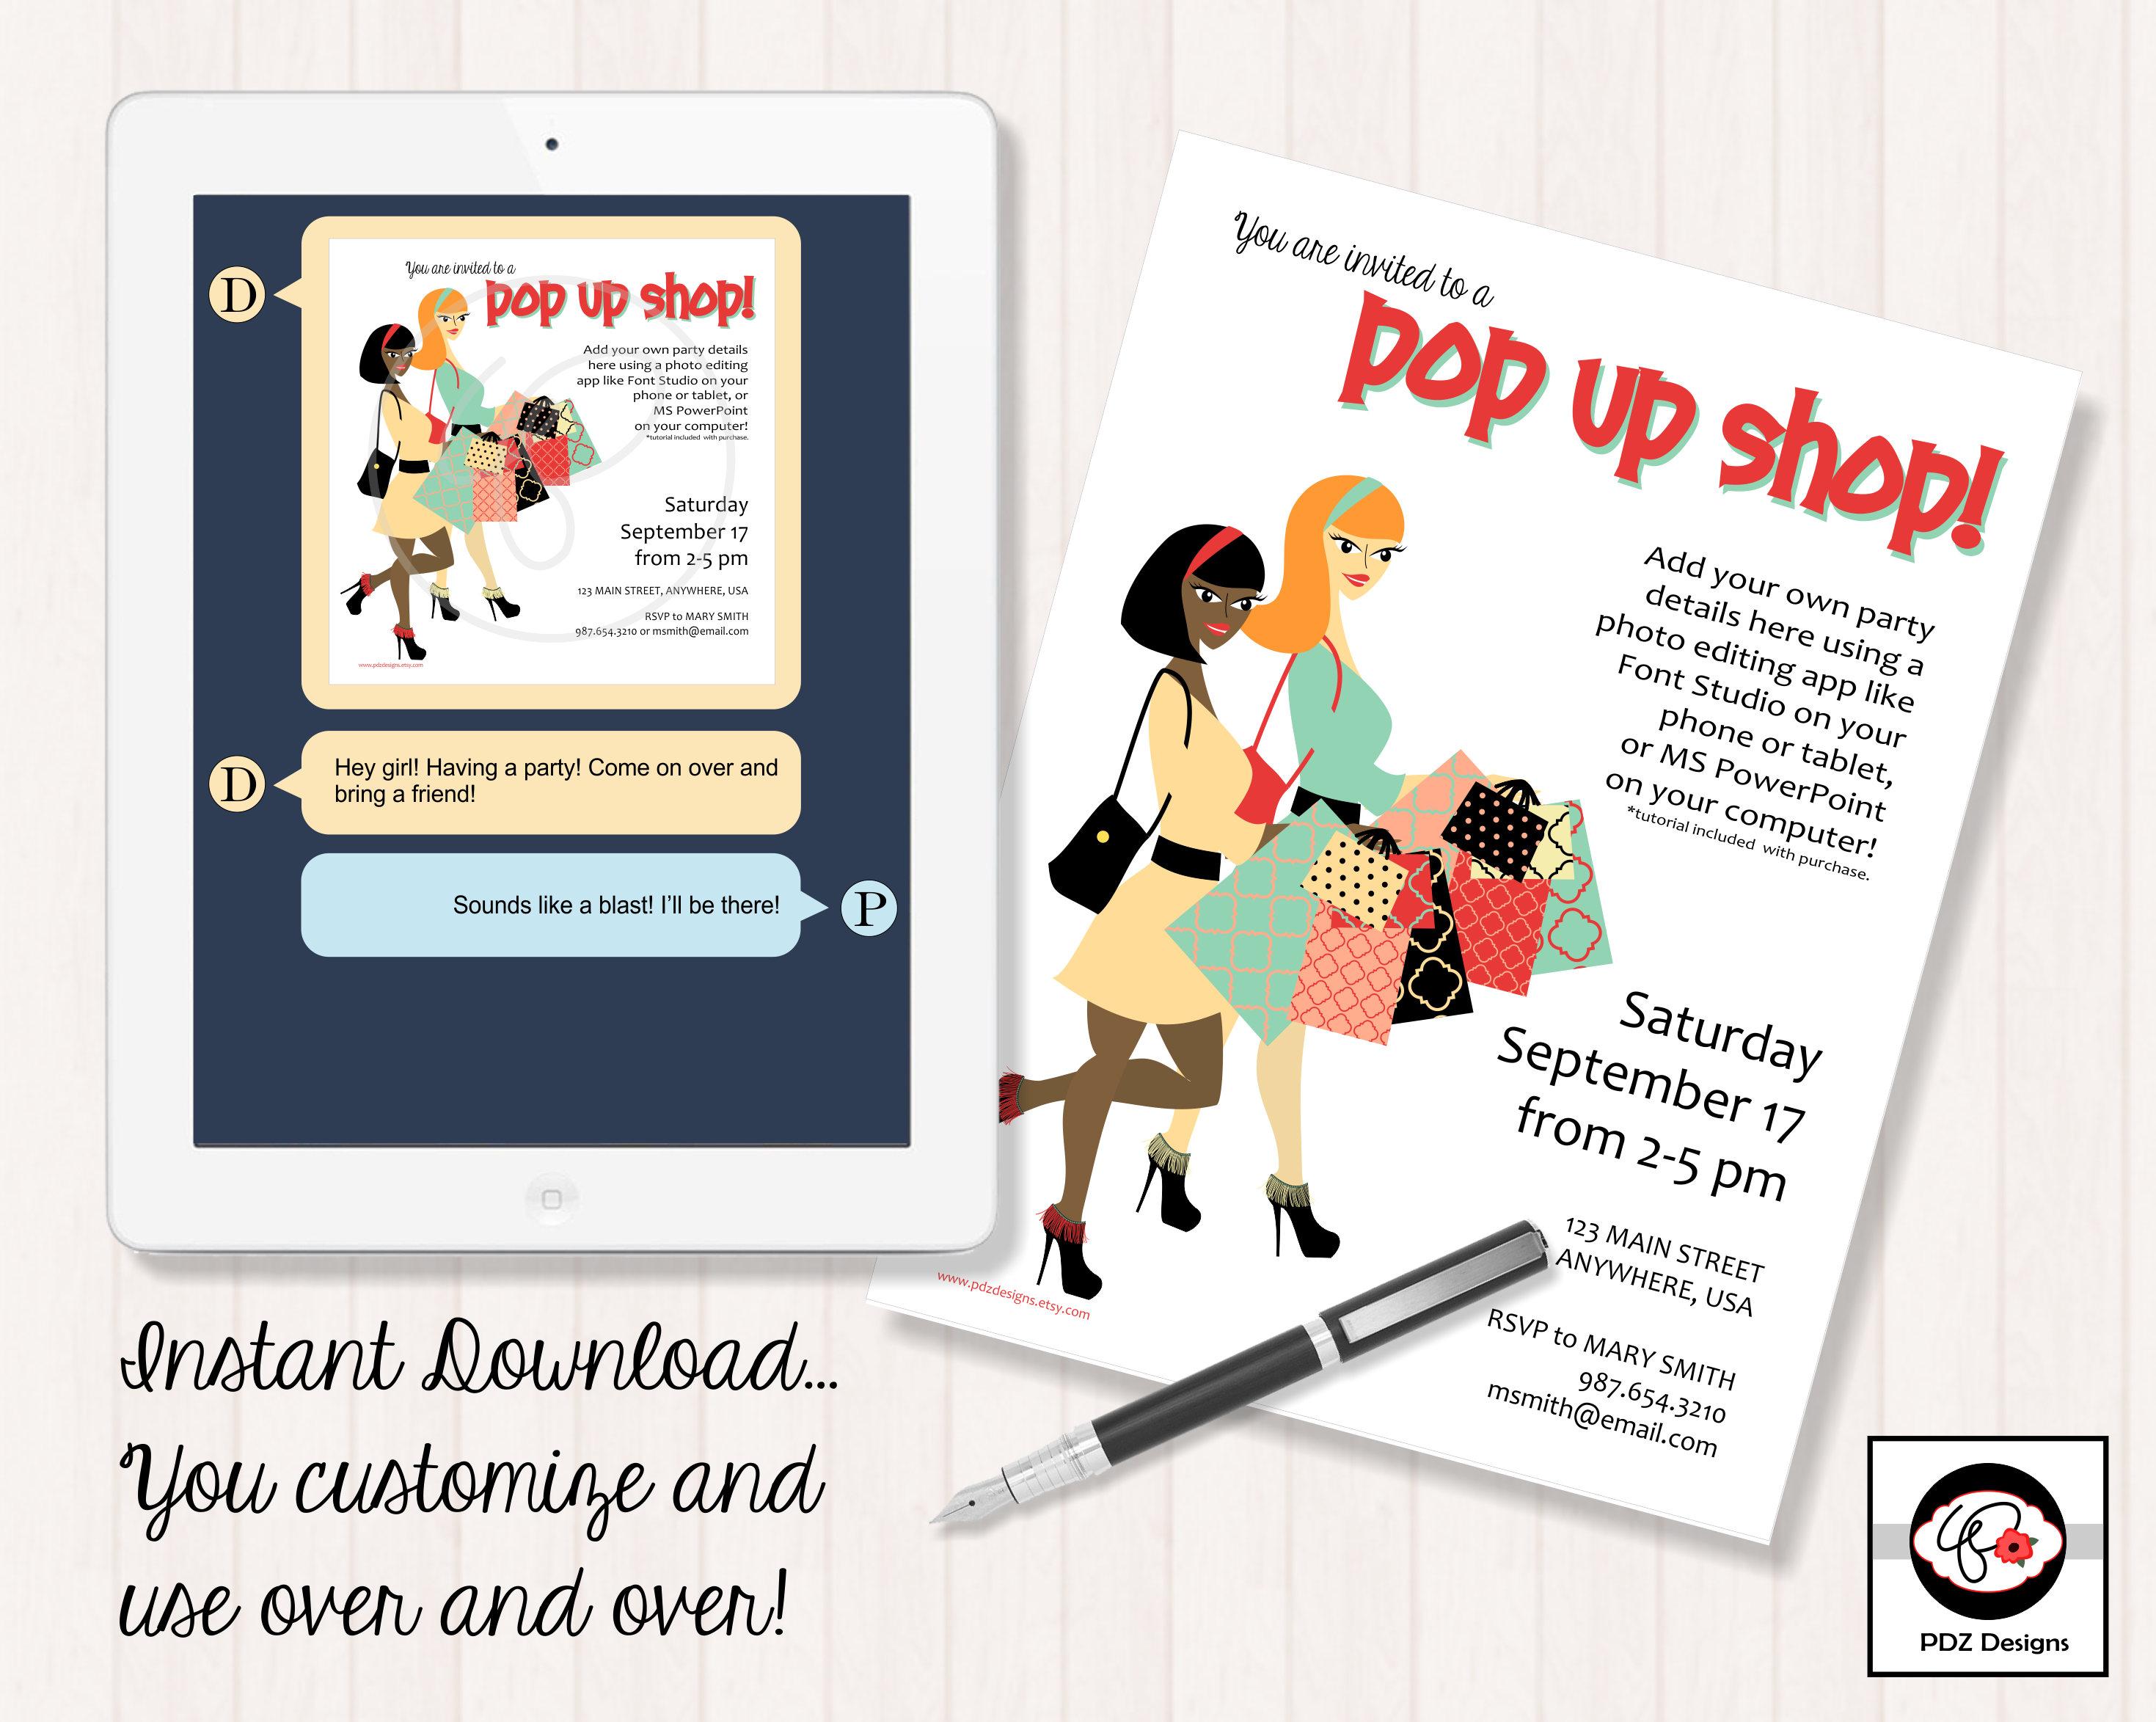 Pop Up Shop Invitation Business Party Invitation Makeup